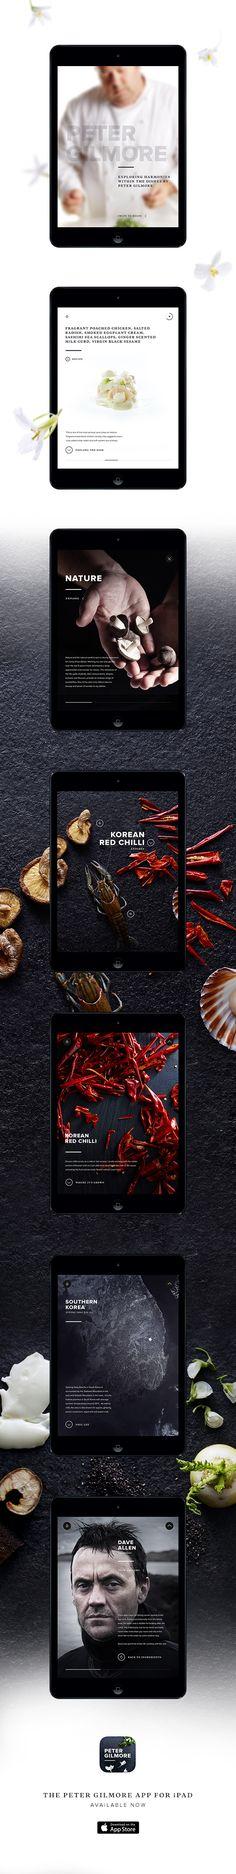 Peter Gilmore iPad App on Behance